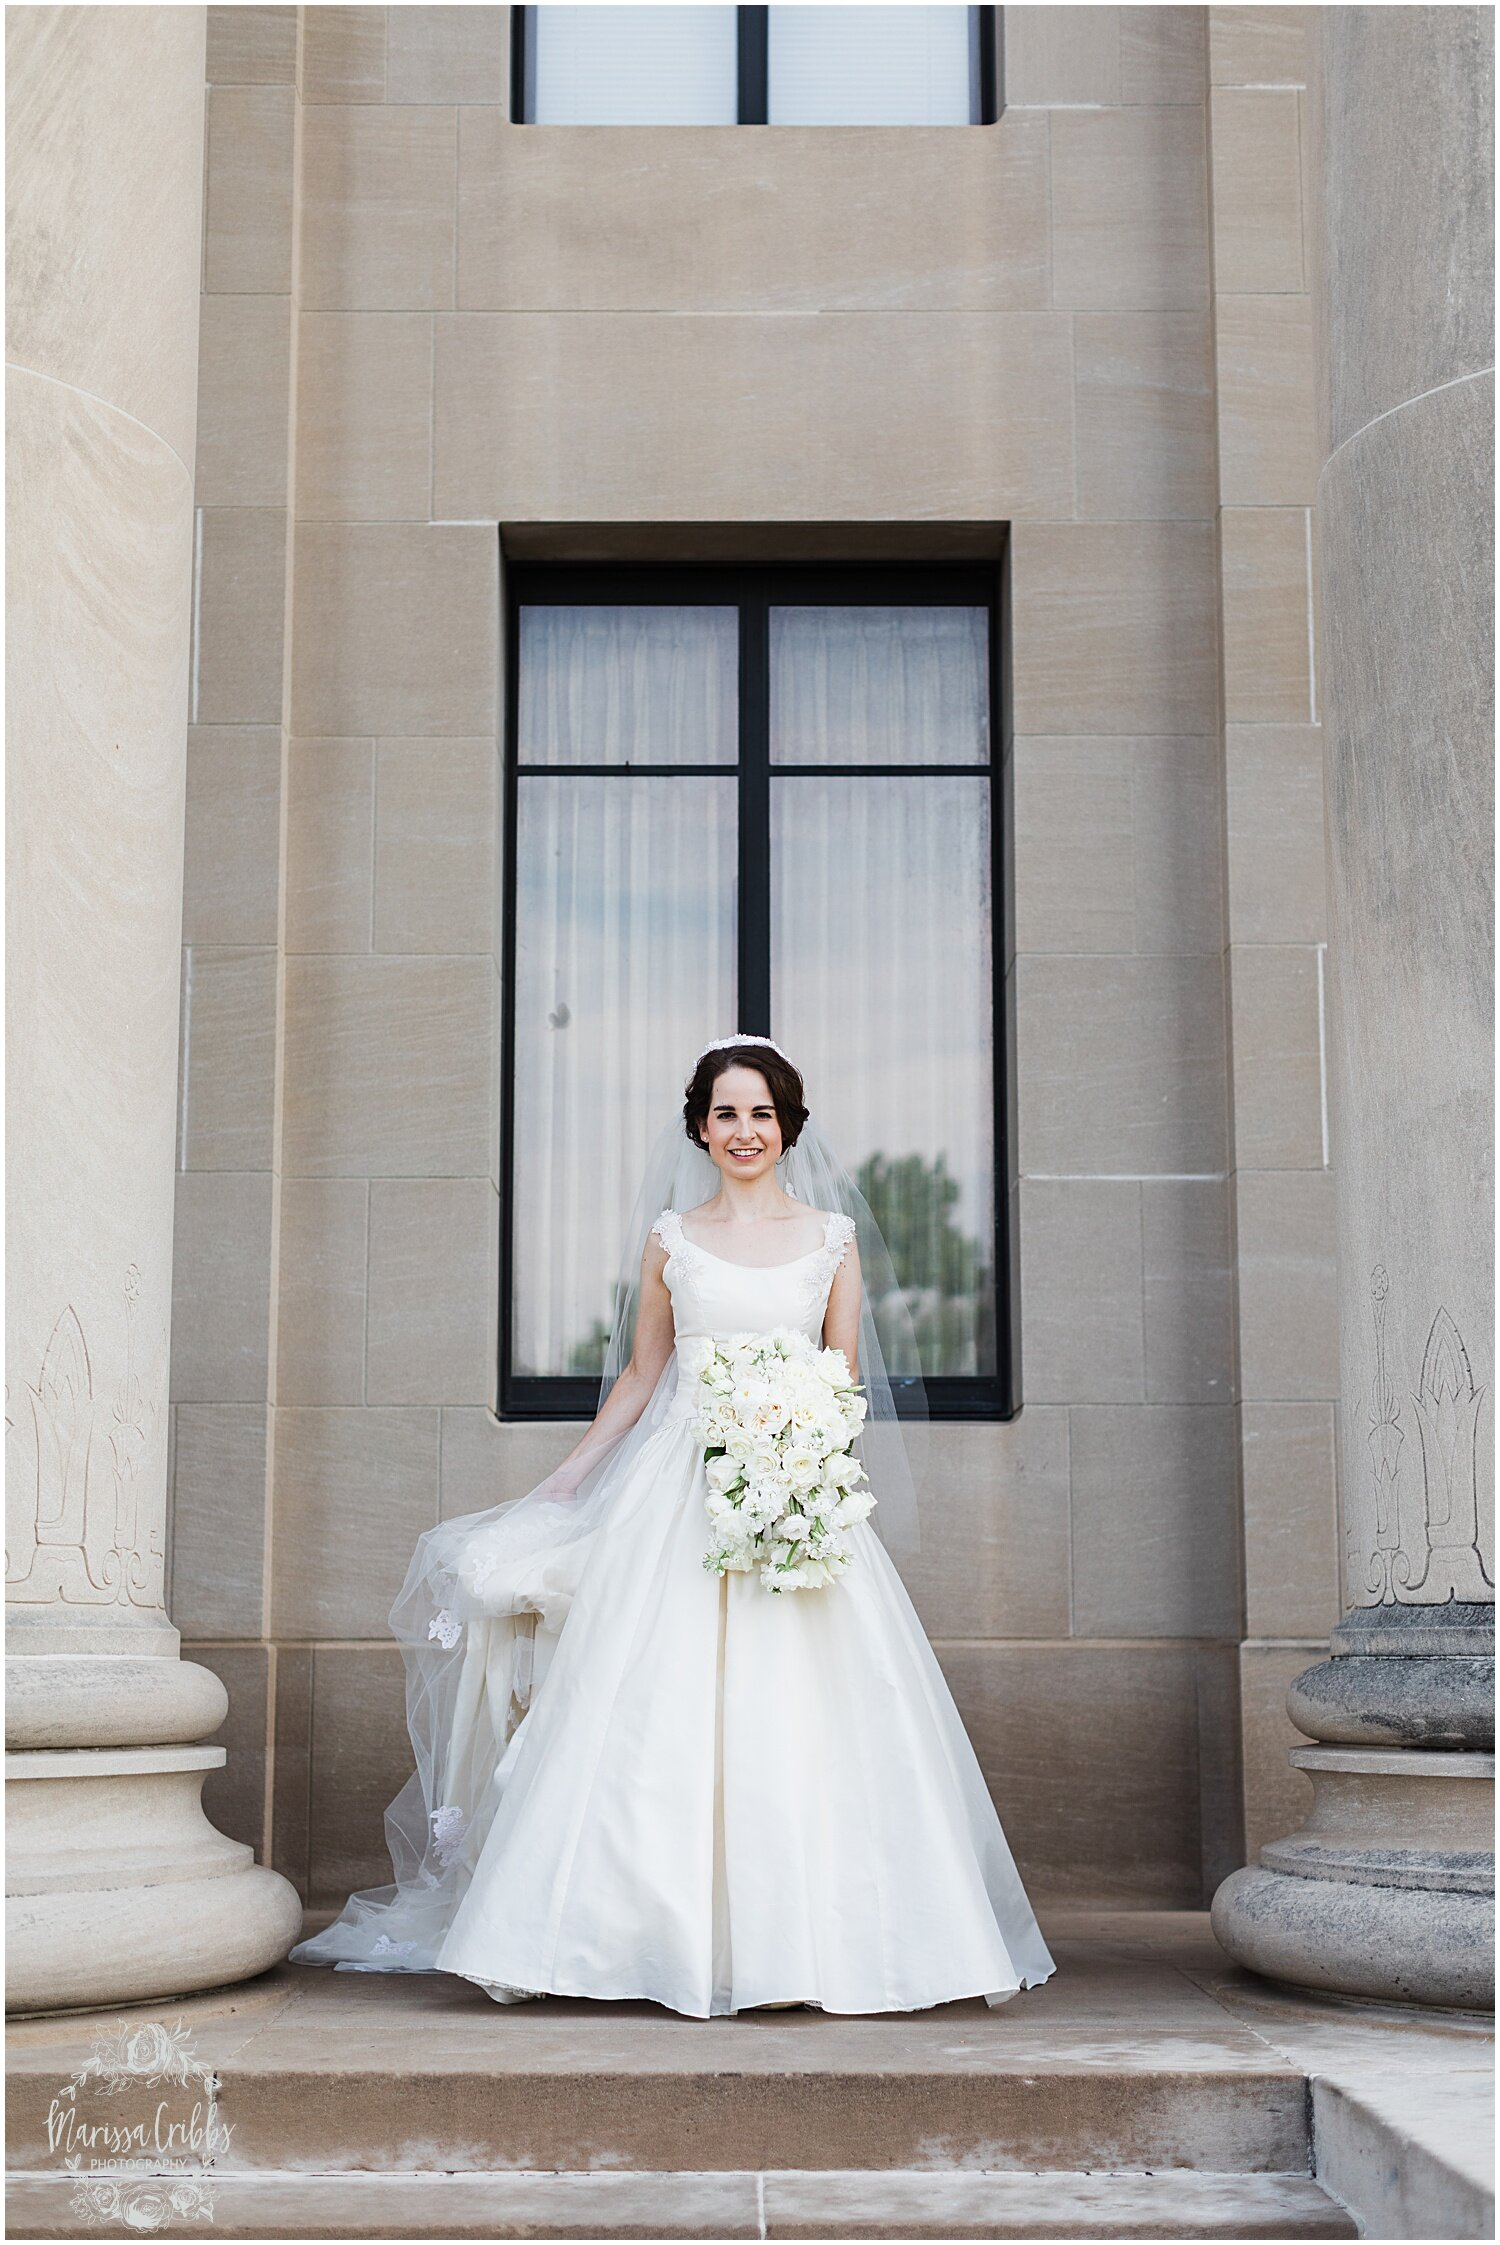 TYLER & CAROLINE MARRIED BLOG | MARISSA CRIBBS PHOTOGRAPHY | THE CARRIAGE CLUB | KANSAS CITY WEDDING PHOTOS_9248.jpg